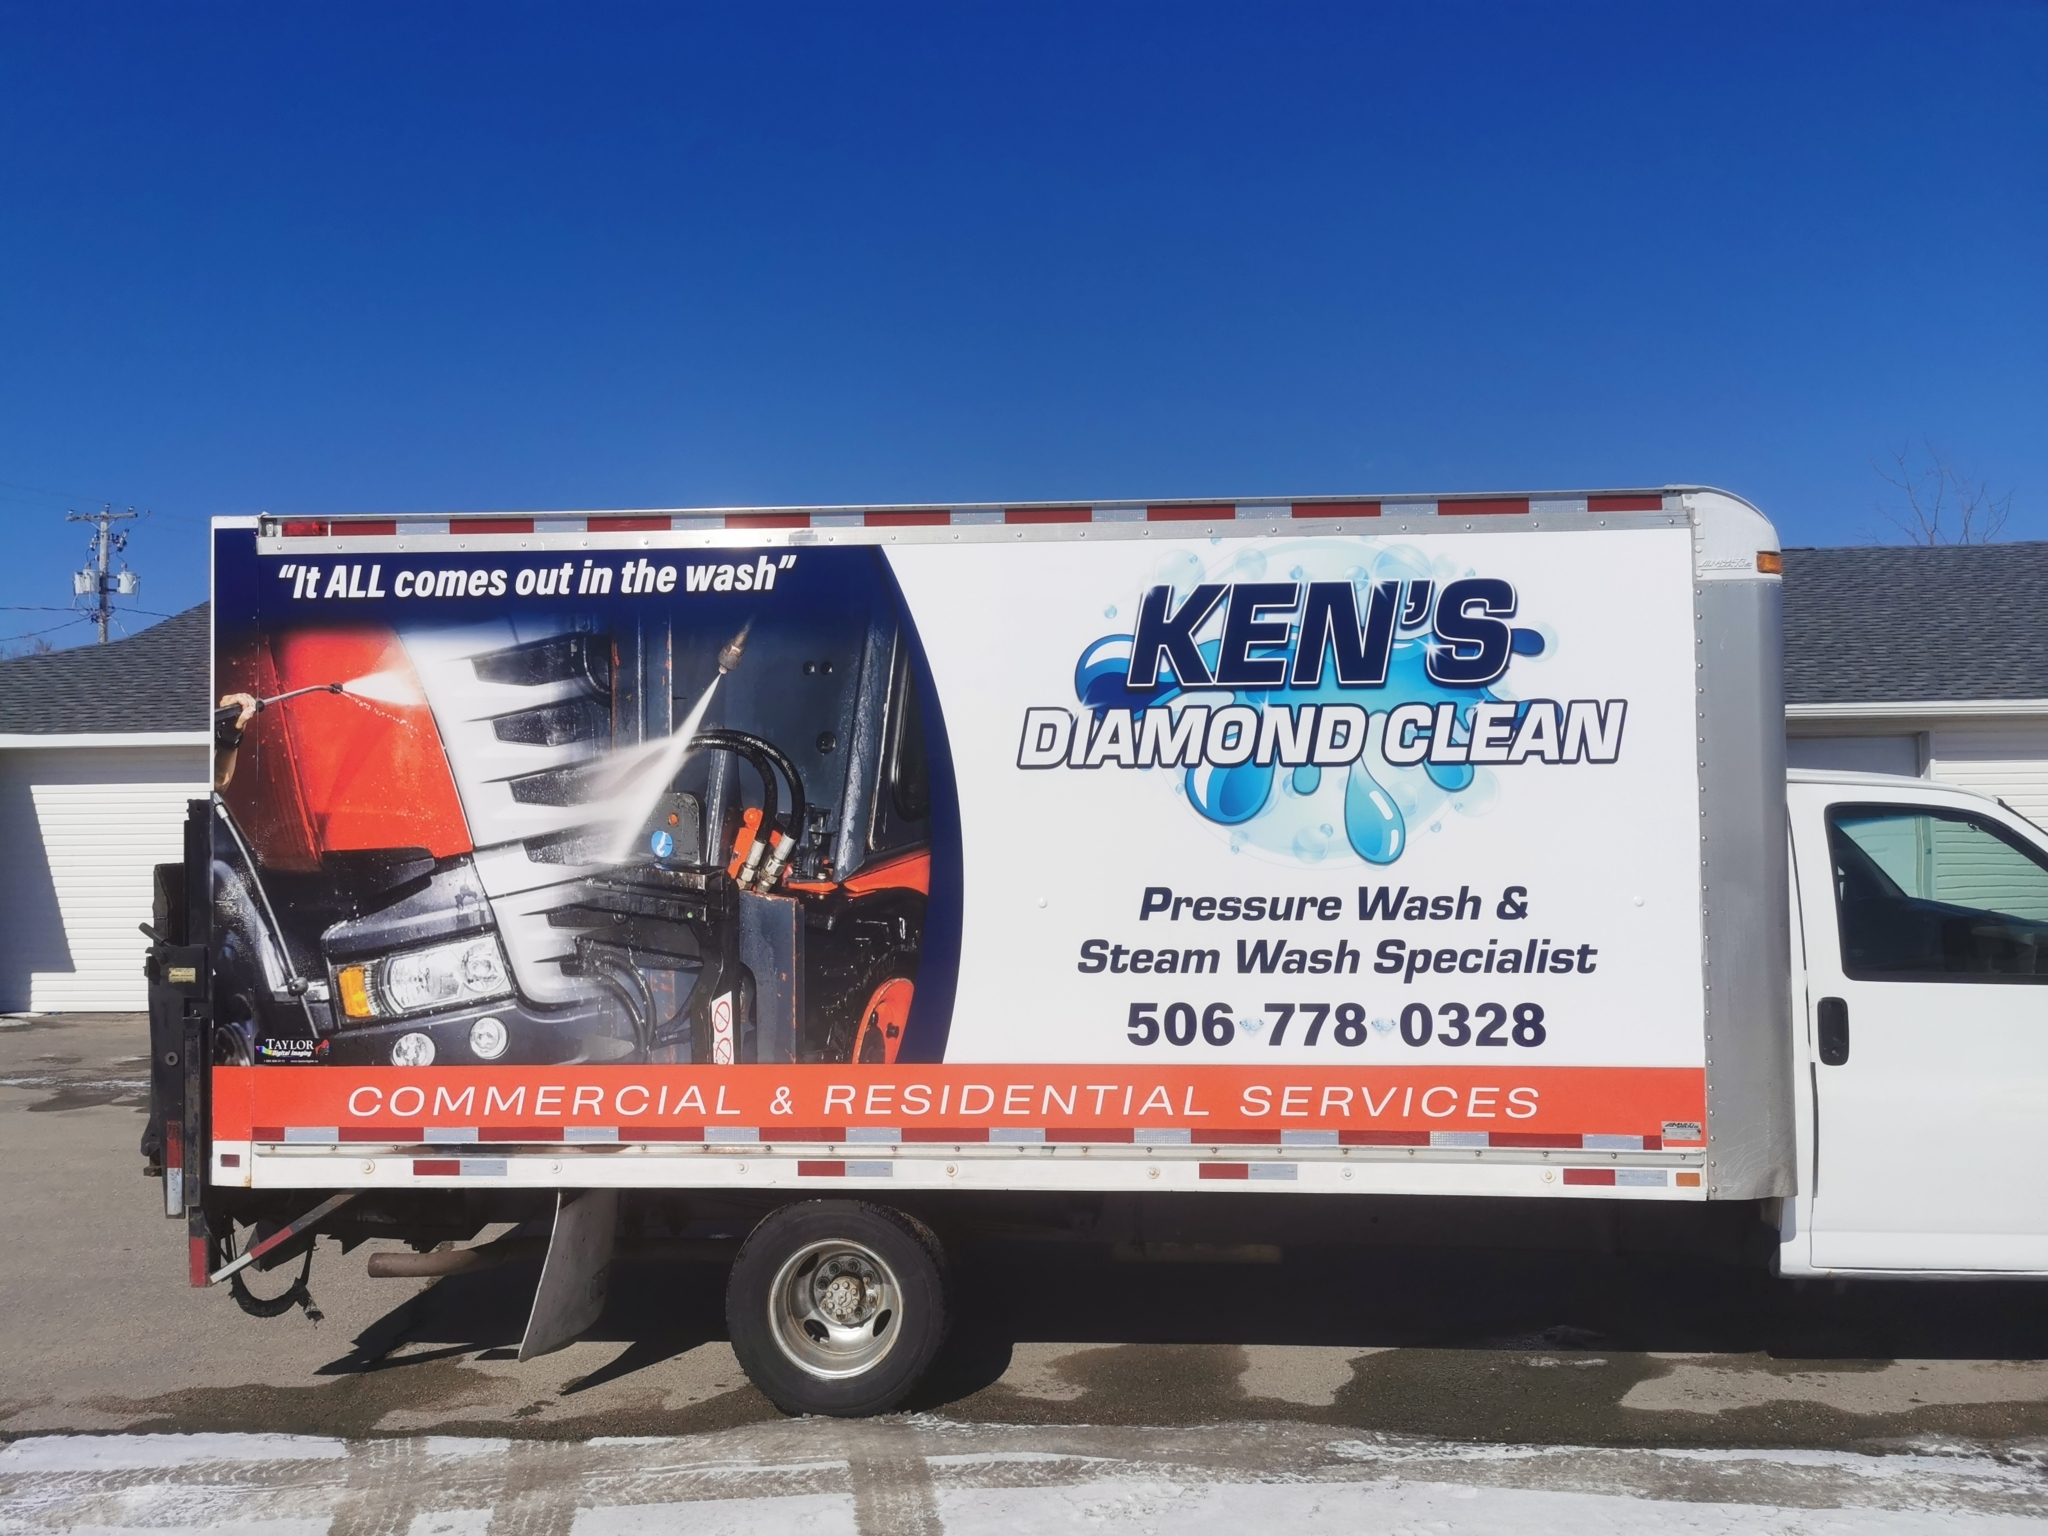 Ken's Diamond Clean à Miramichi